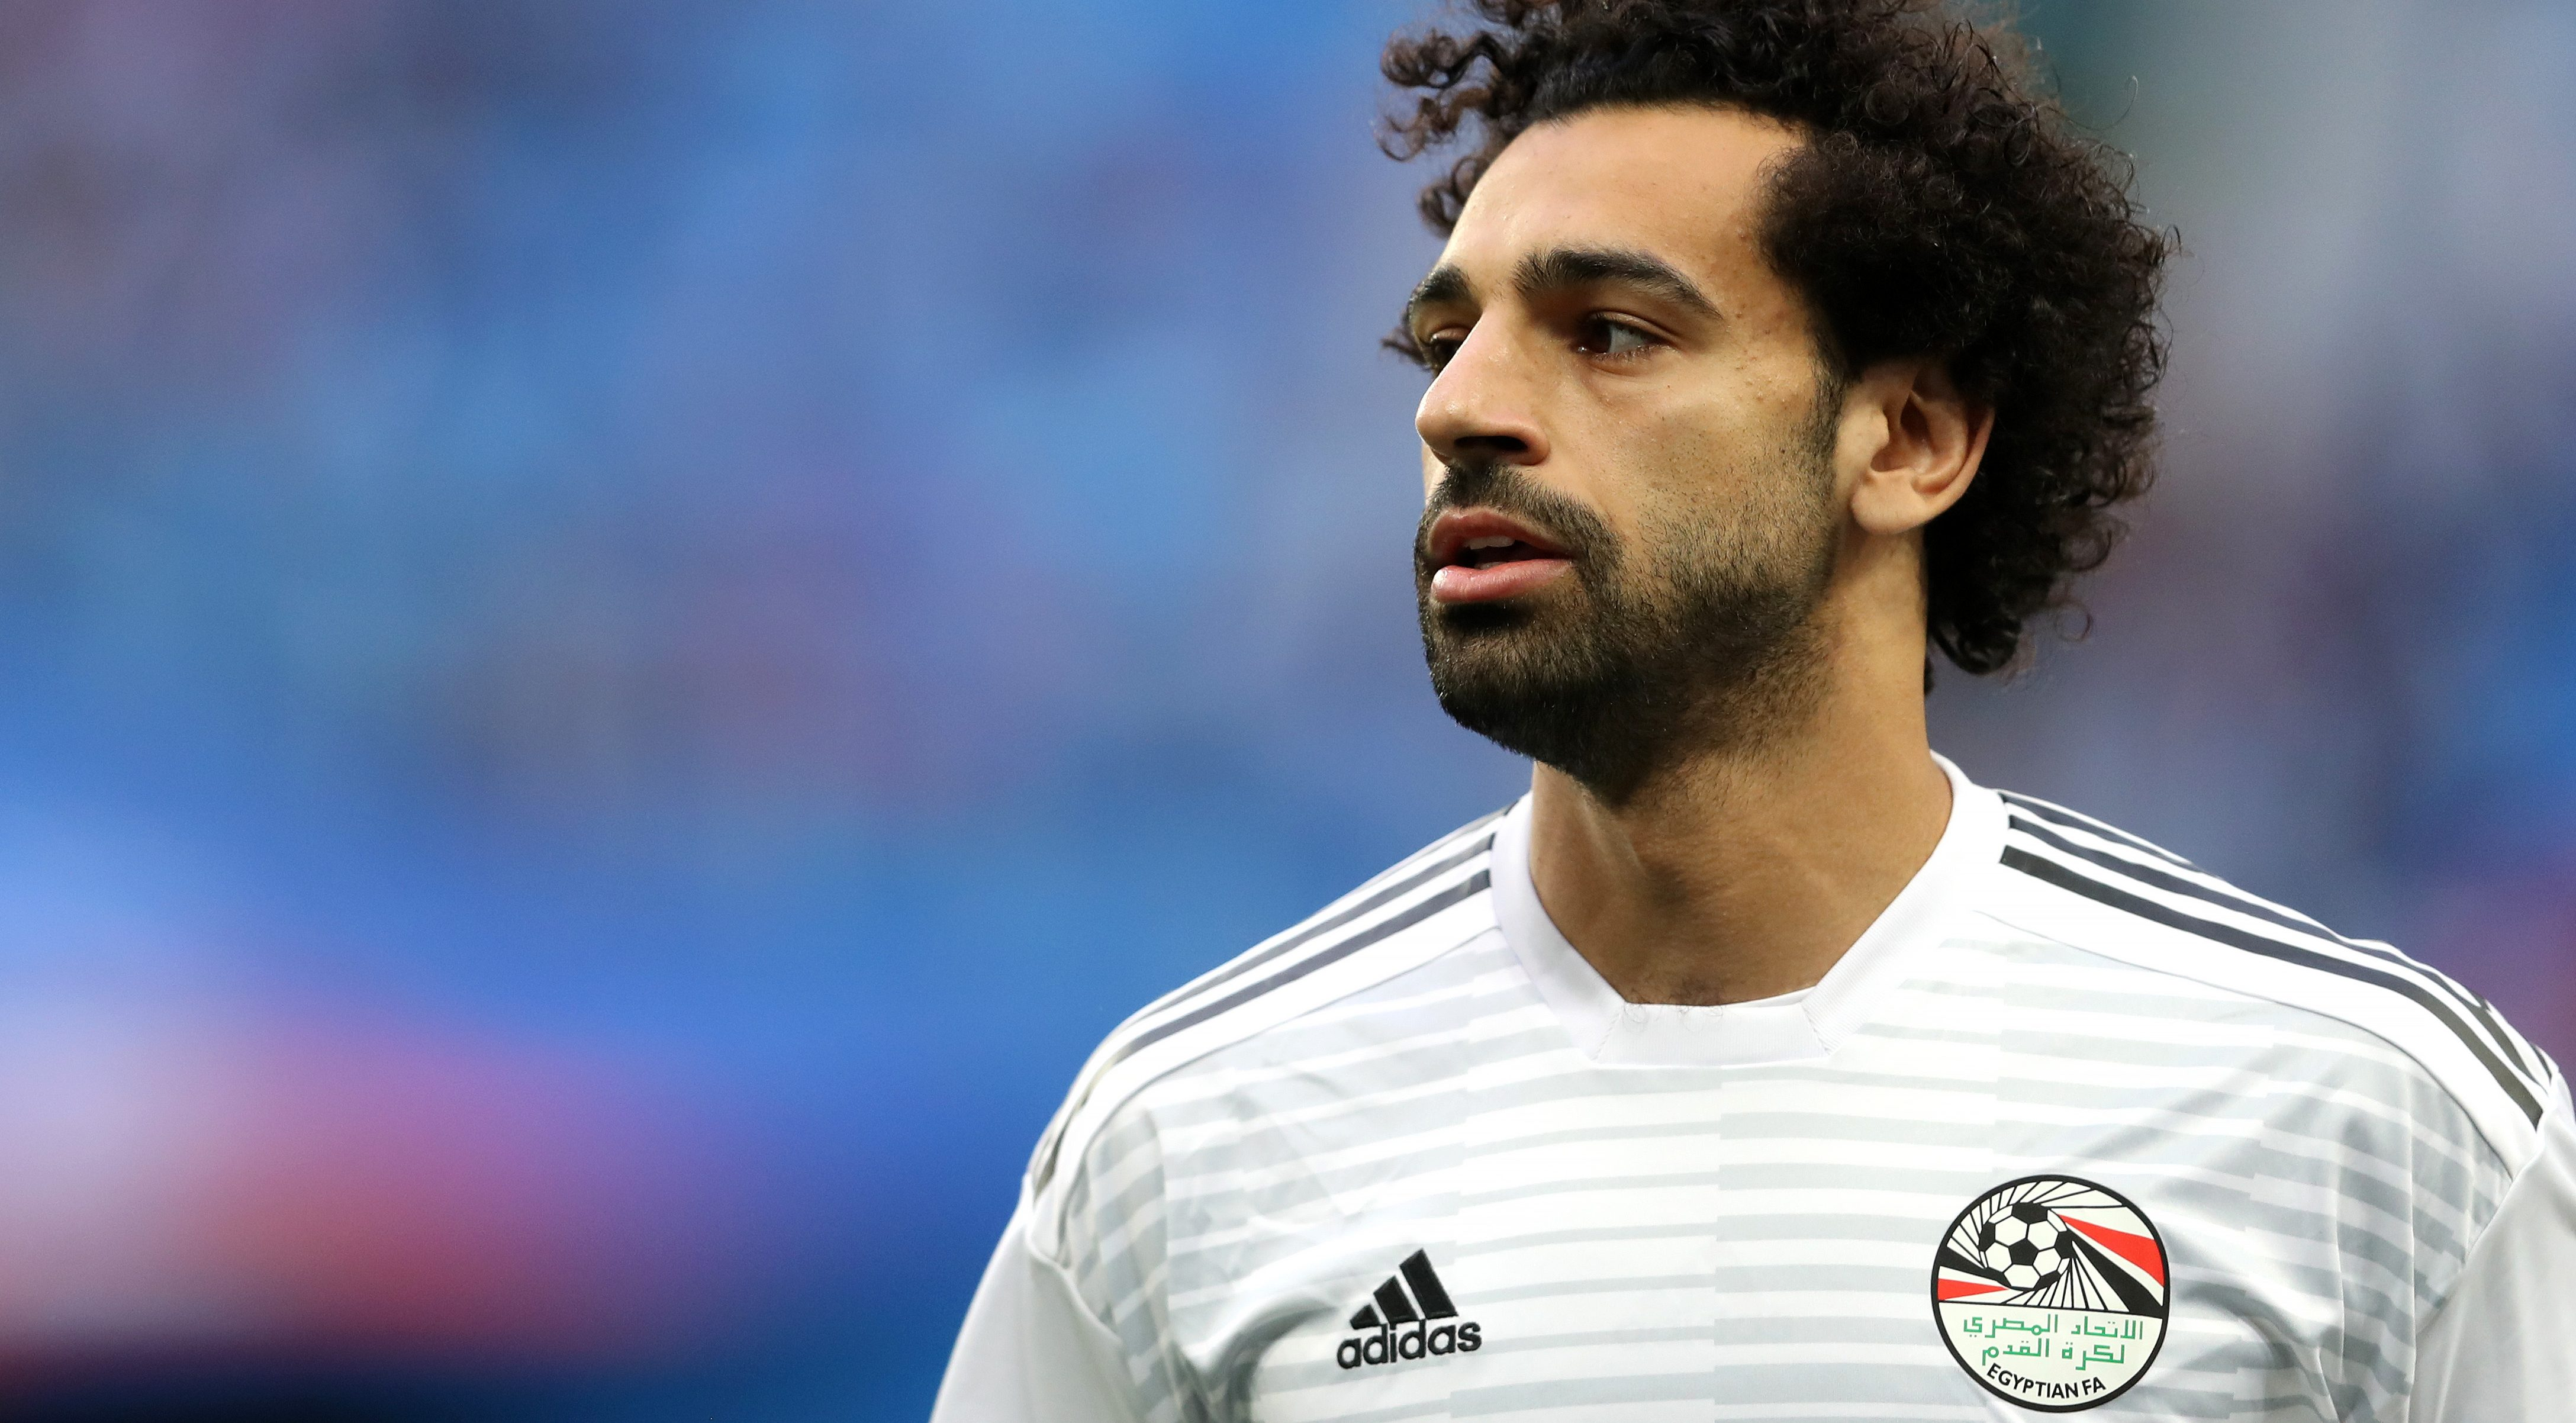 Previa Arabia Saudita contra Egipto